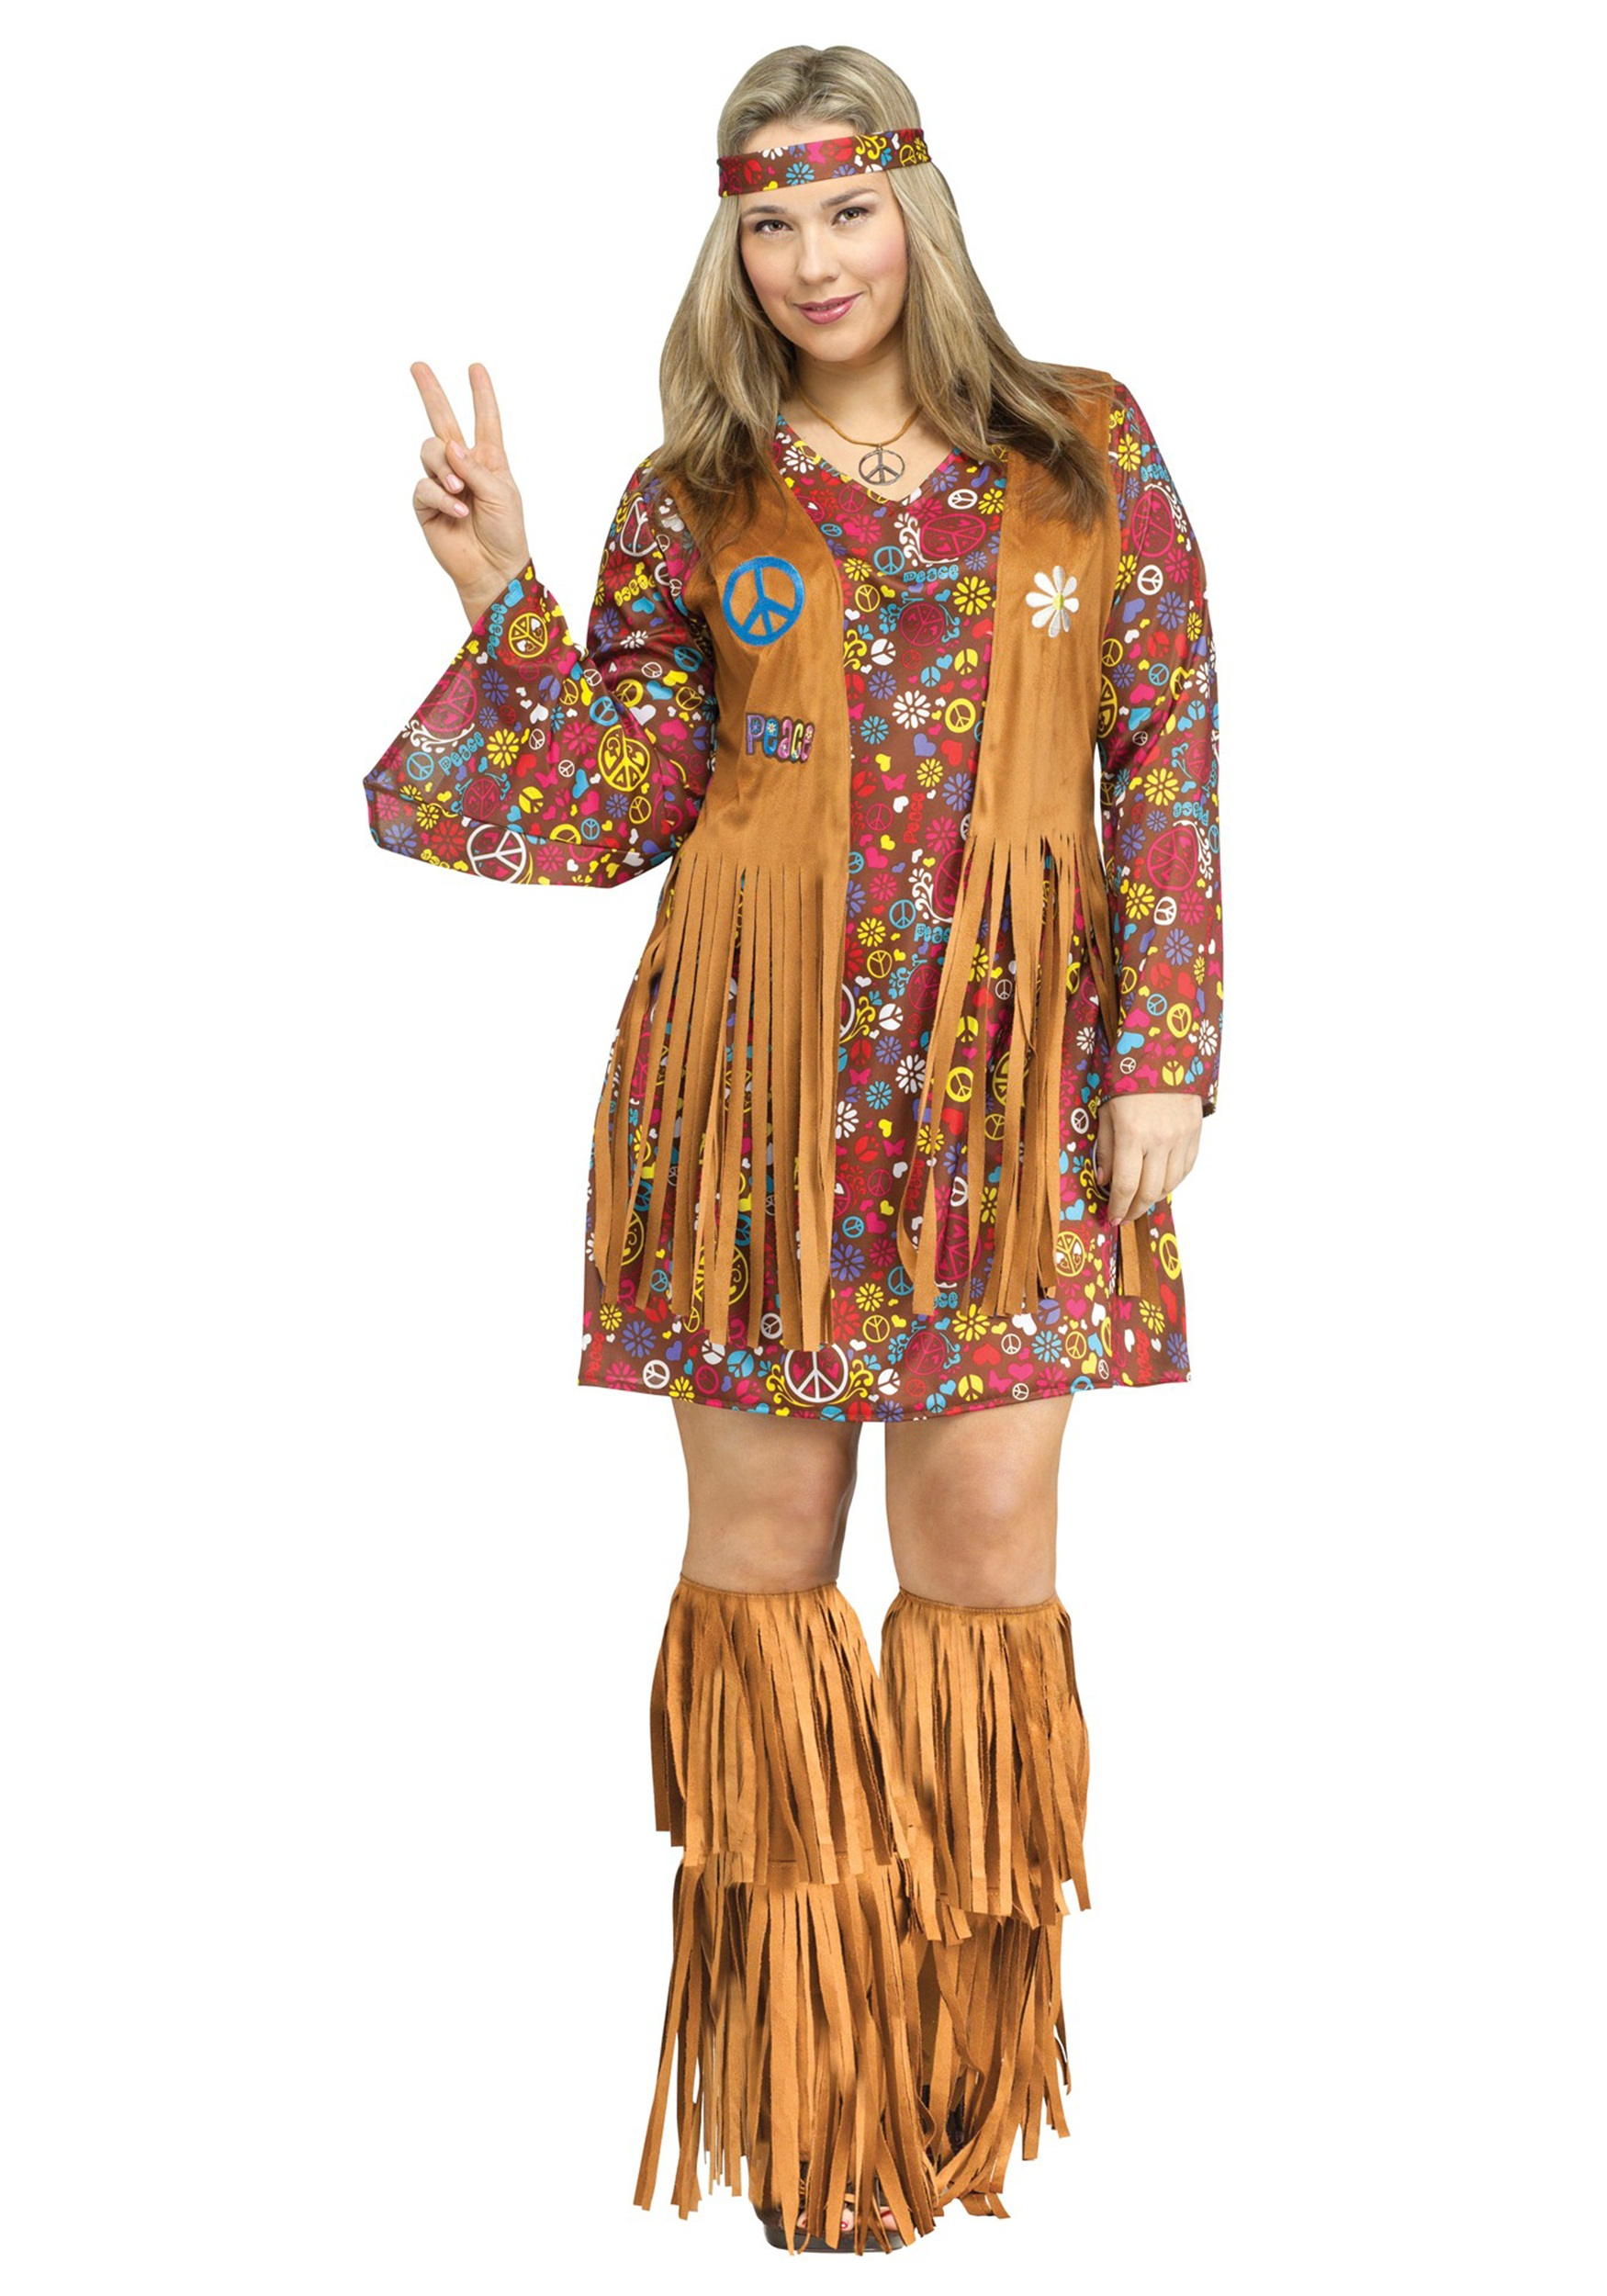 Peace & Love Plus Size Costume | Hippie Plus Size Costume